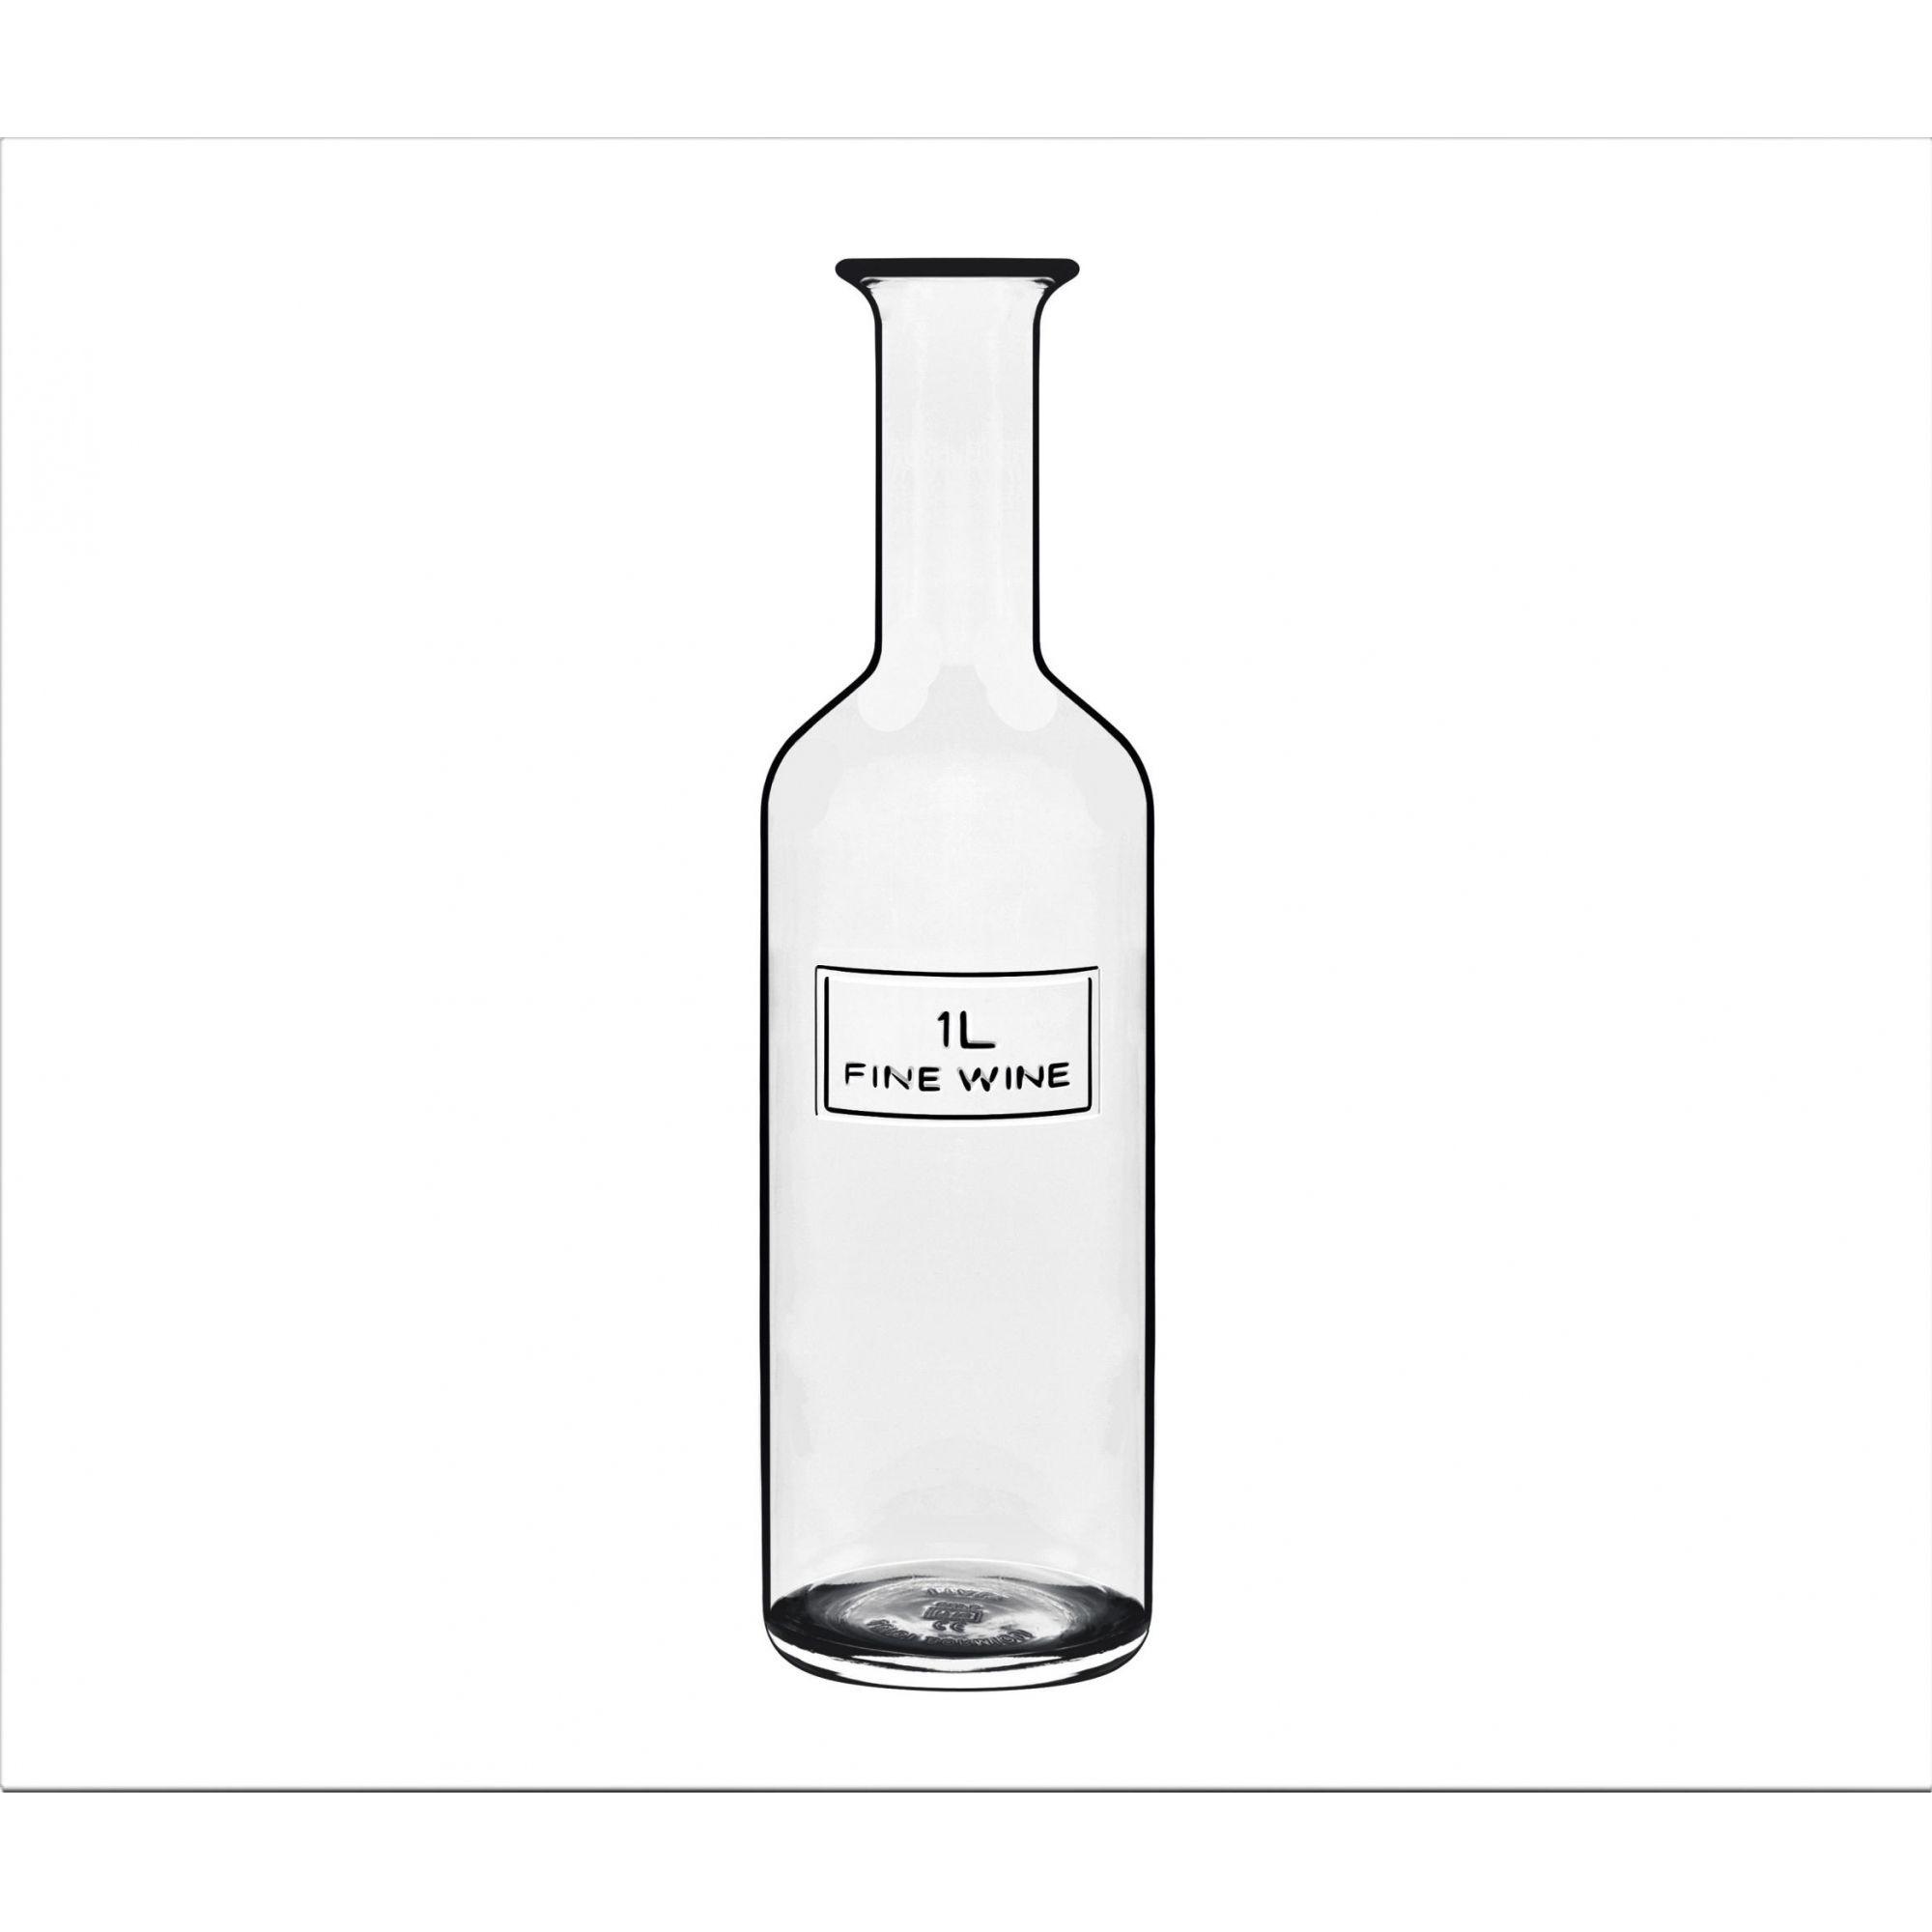 Garrafa de Agua e Suco Luigi Bormioli em Vidro 1 L Optima Fine Wine